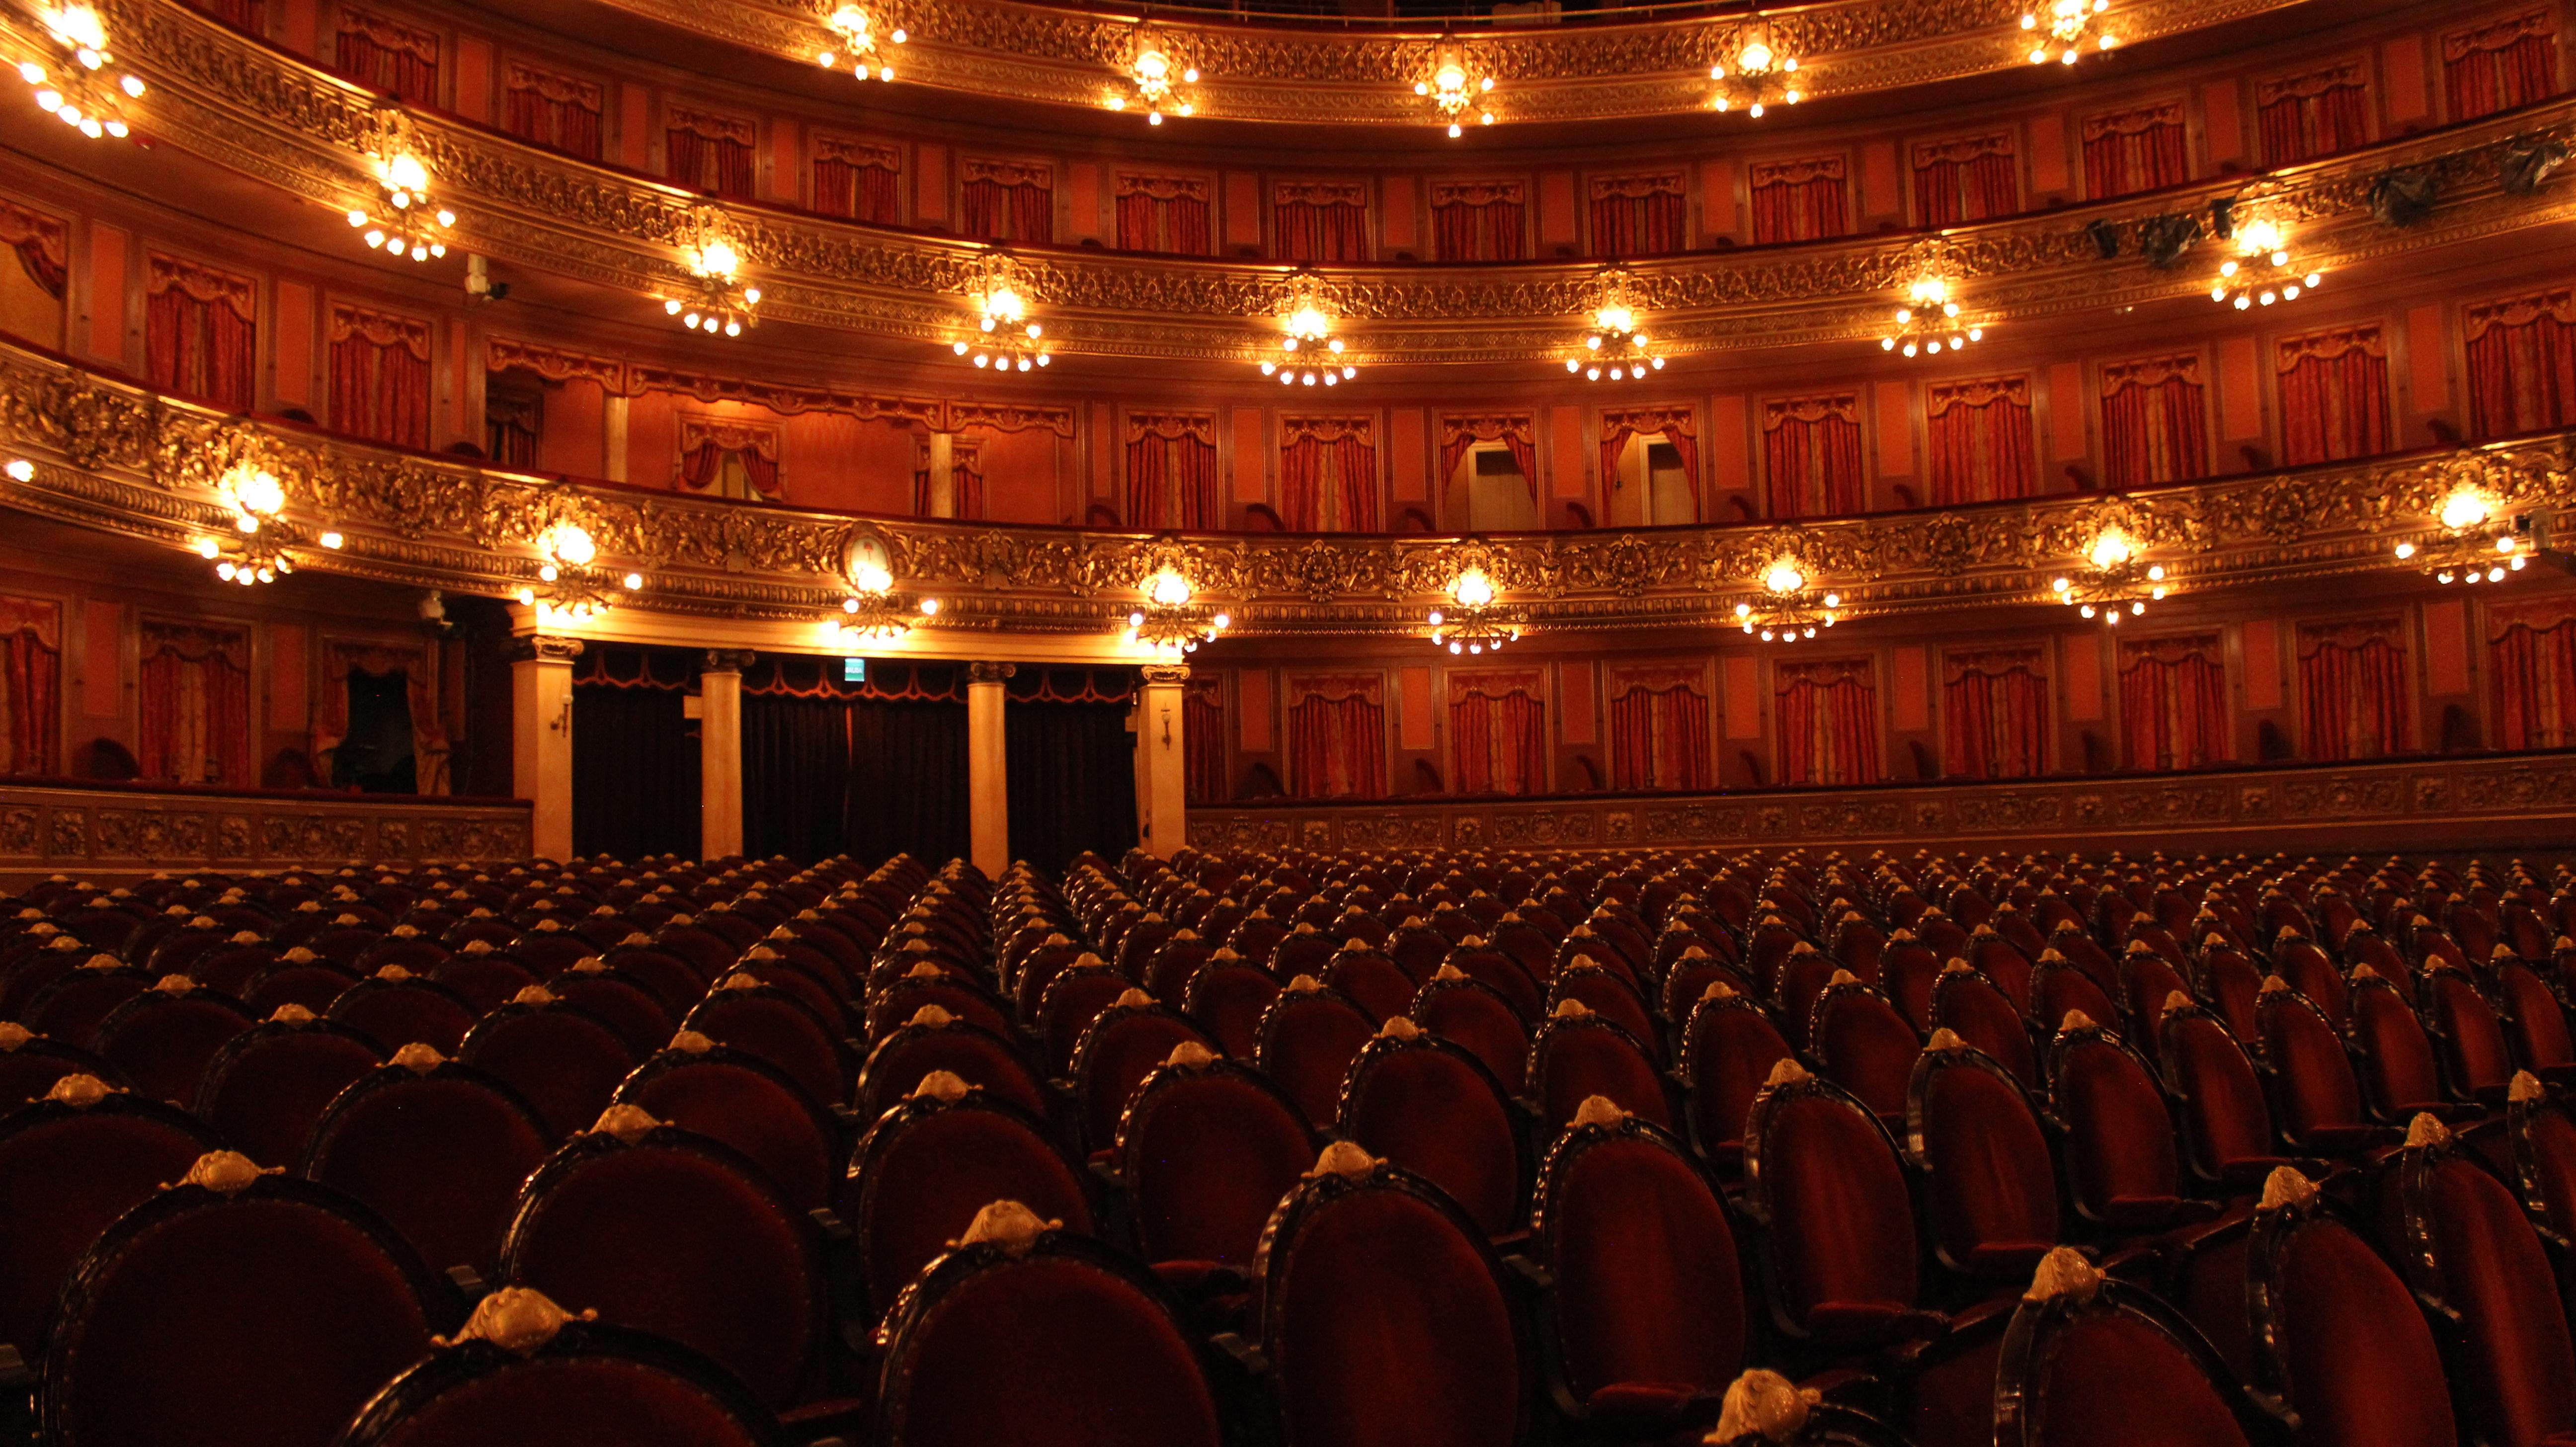 11 - Teatro Colon, Buenos Aires